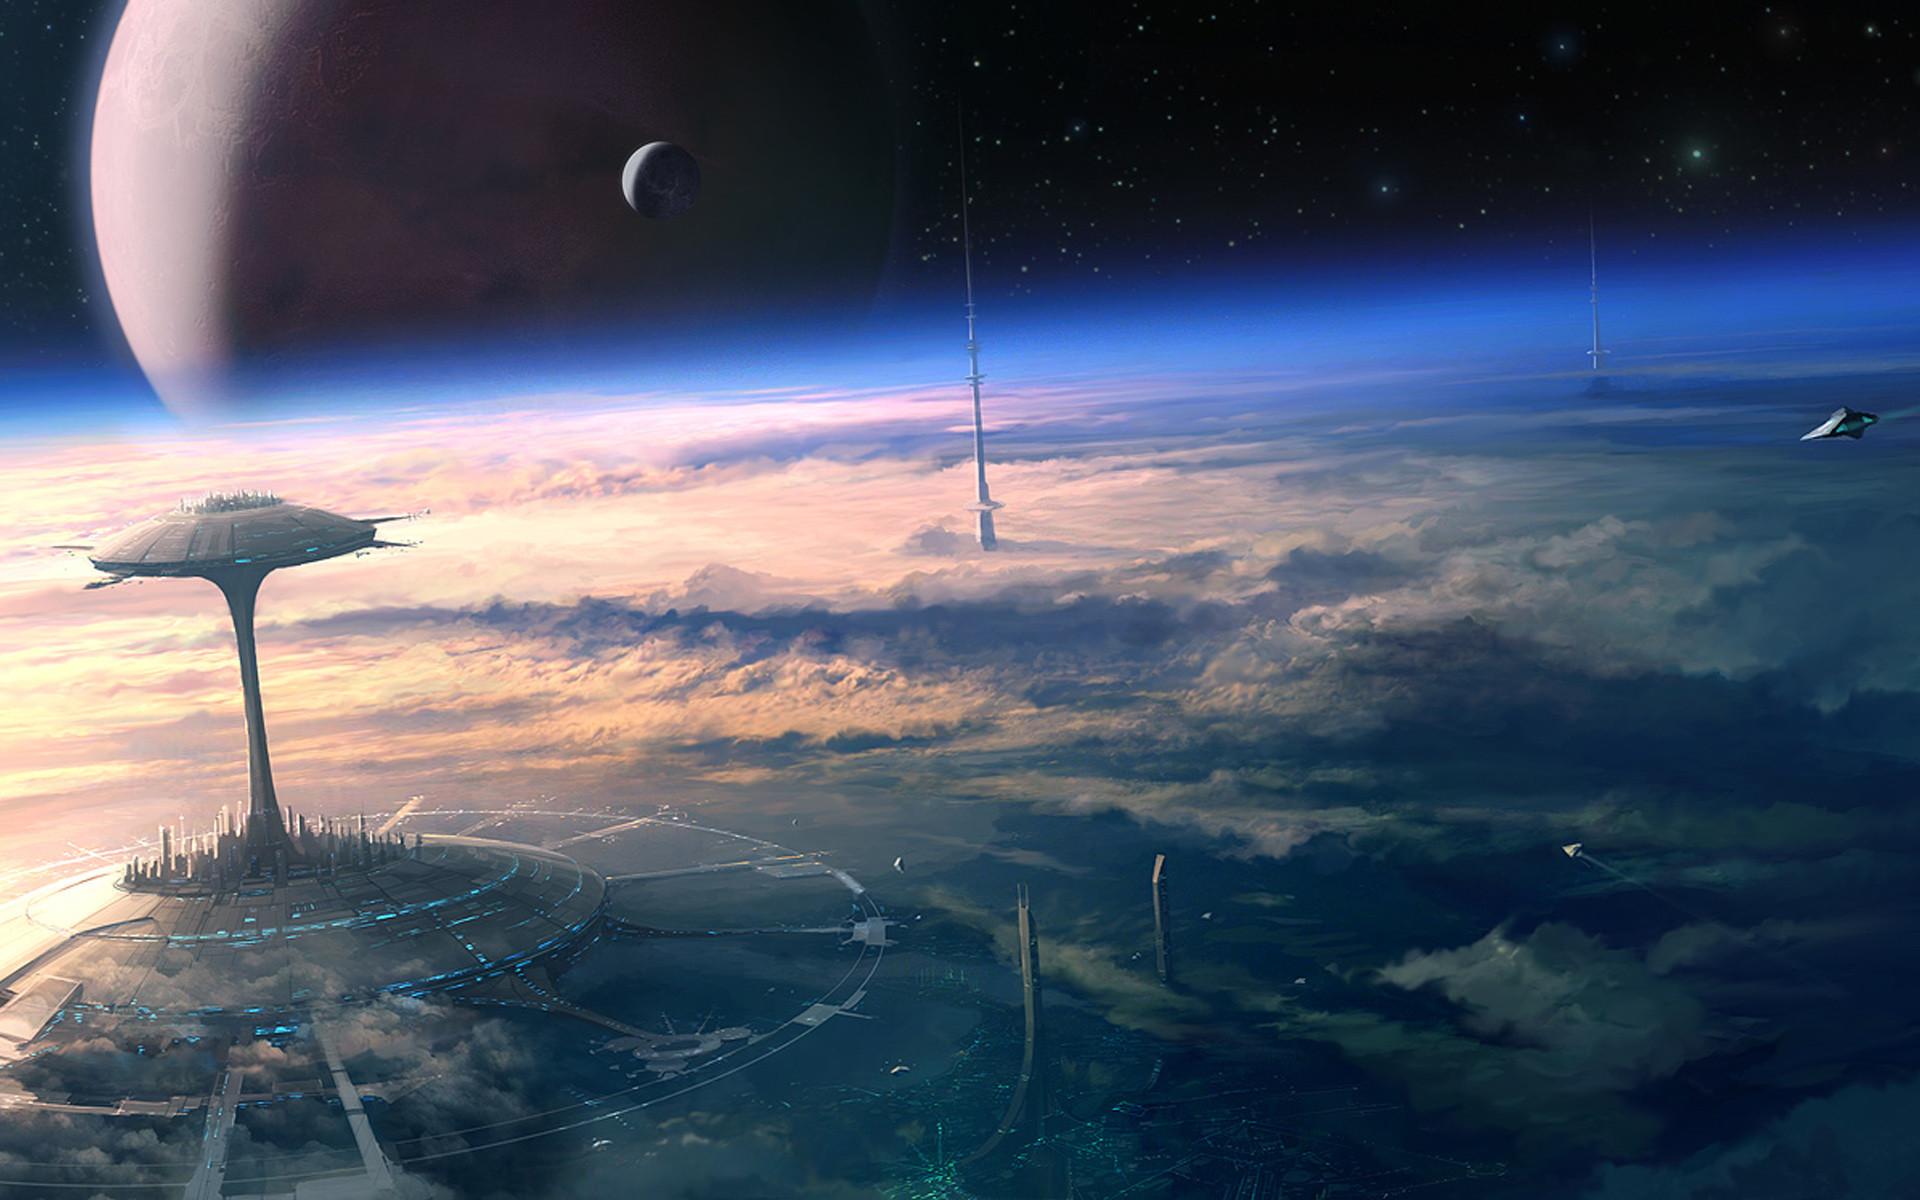 Science Fiction Interface – https://www.fullhdwpp.com/cities/science-fiction-interface/    Full HD Wallpapers   Pinterest   Fiction, Hd wallpaper and Sci fi